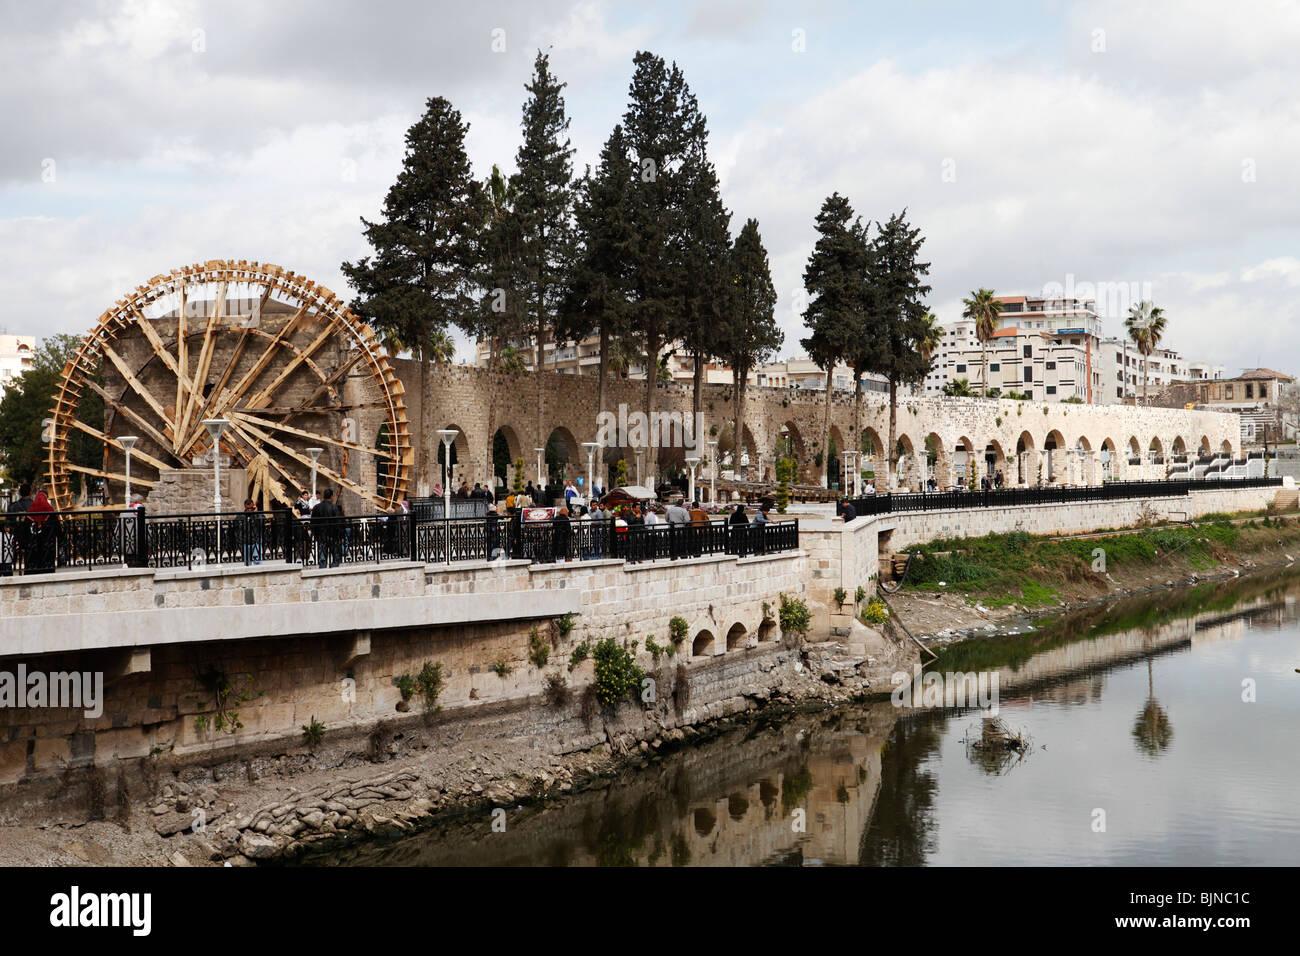 Water wheel or noria in Hama, Syria - Stock Image